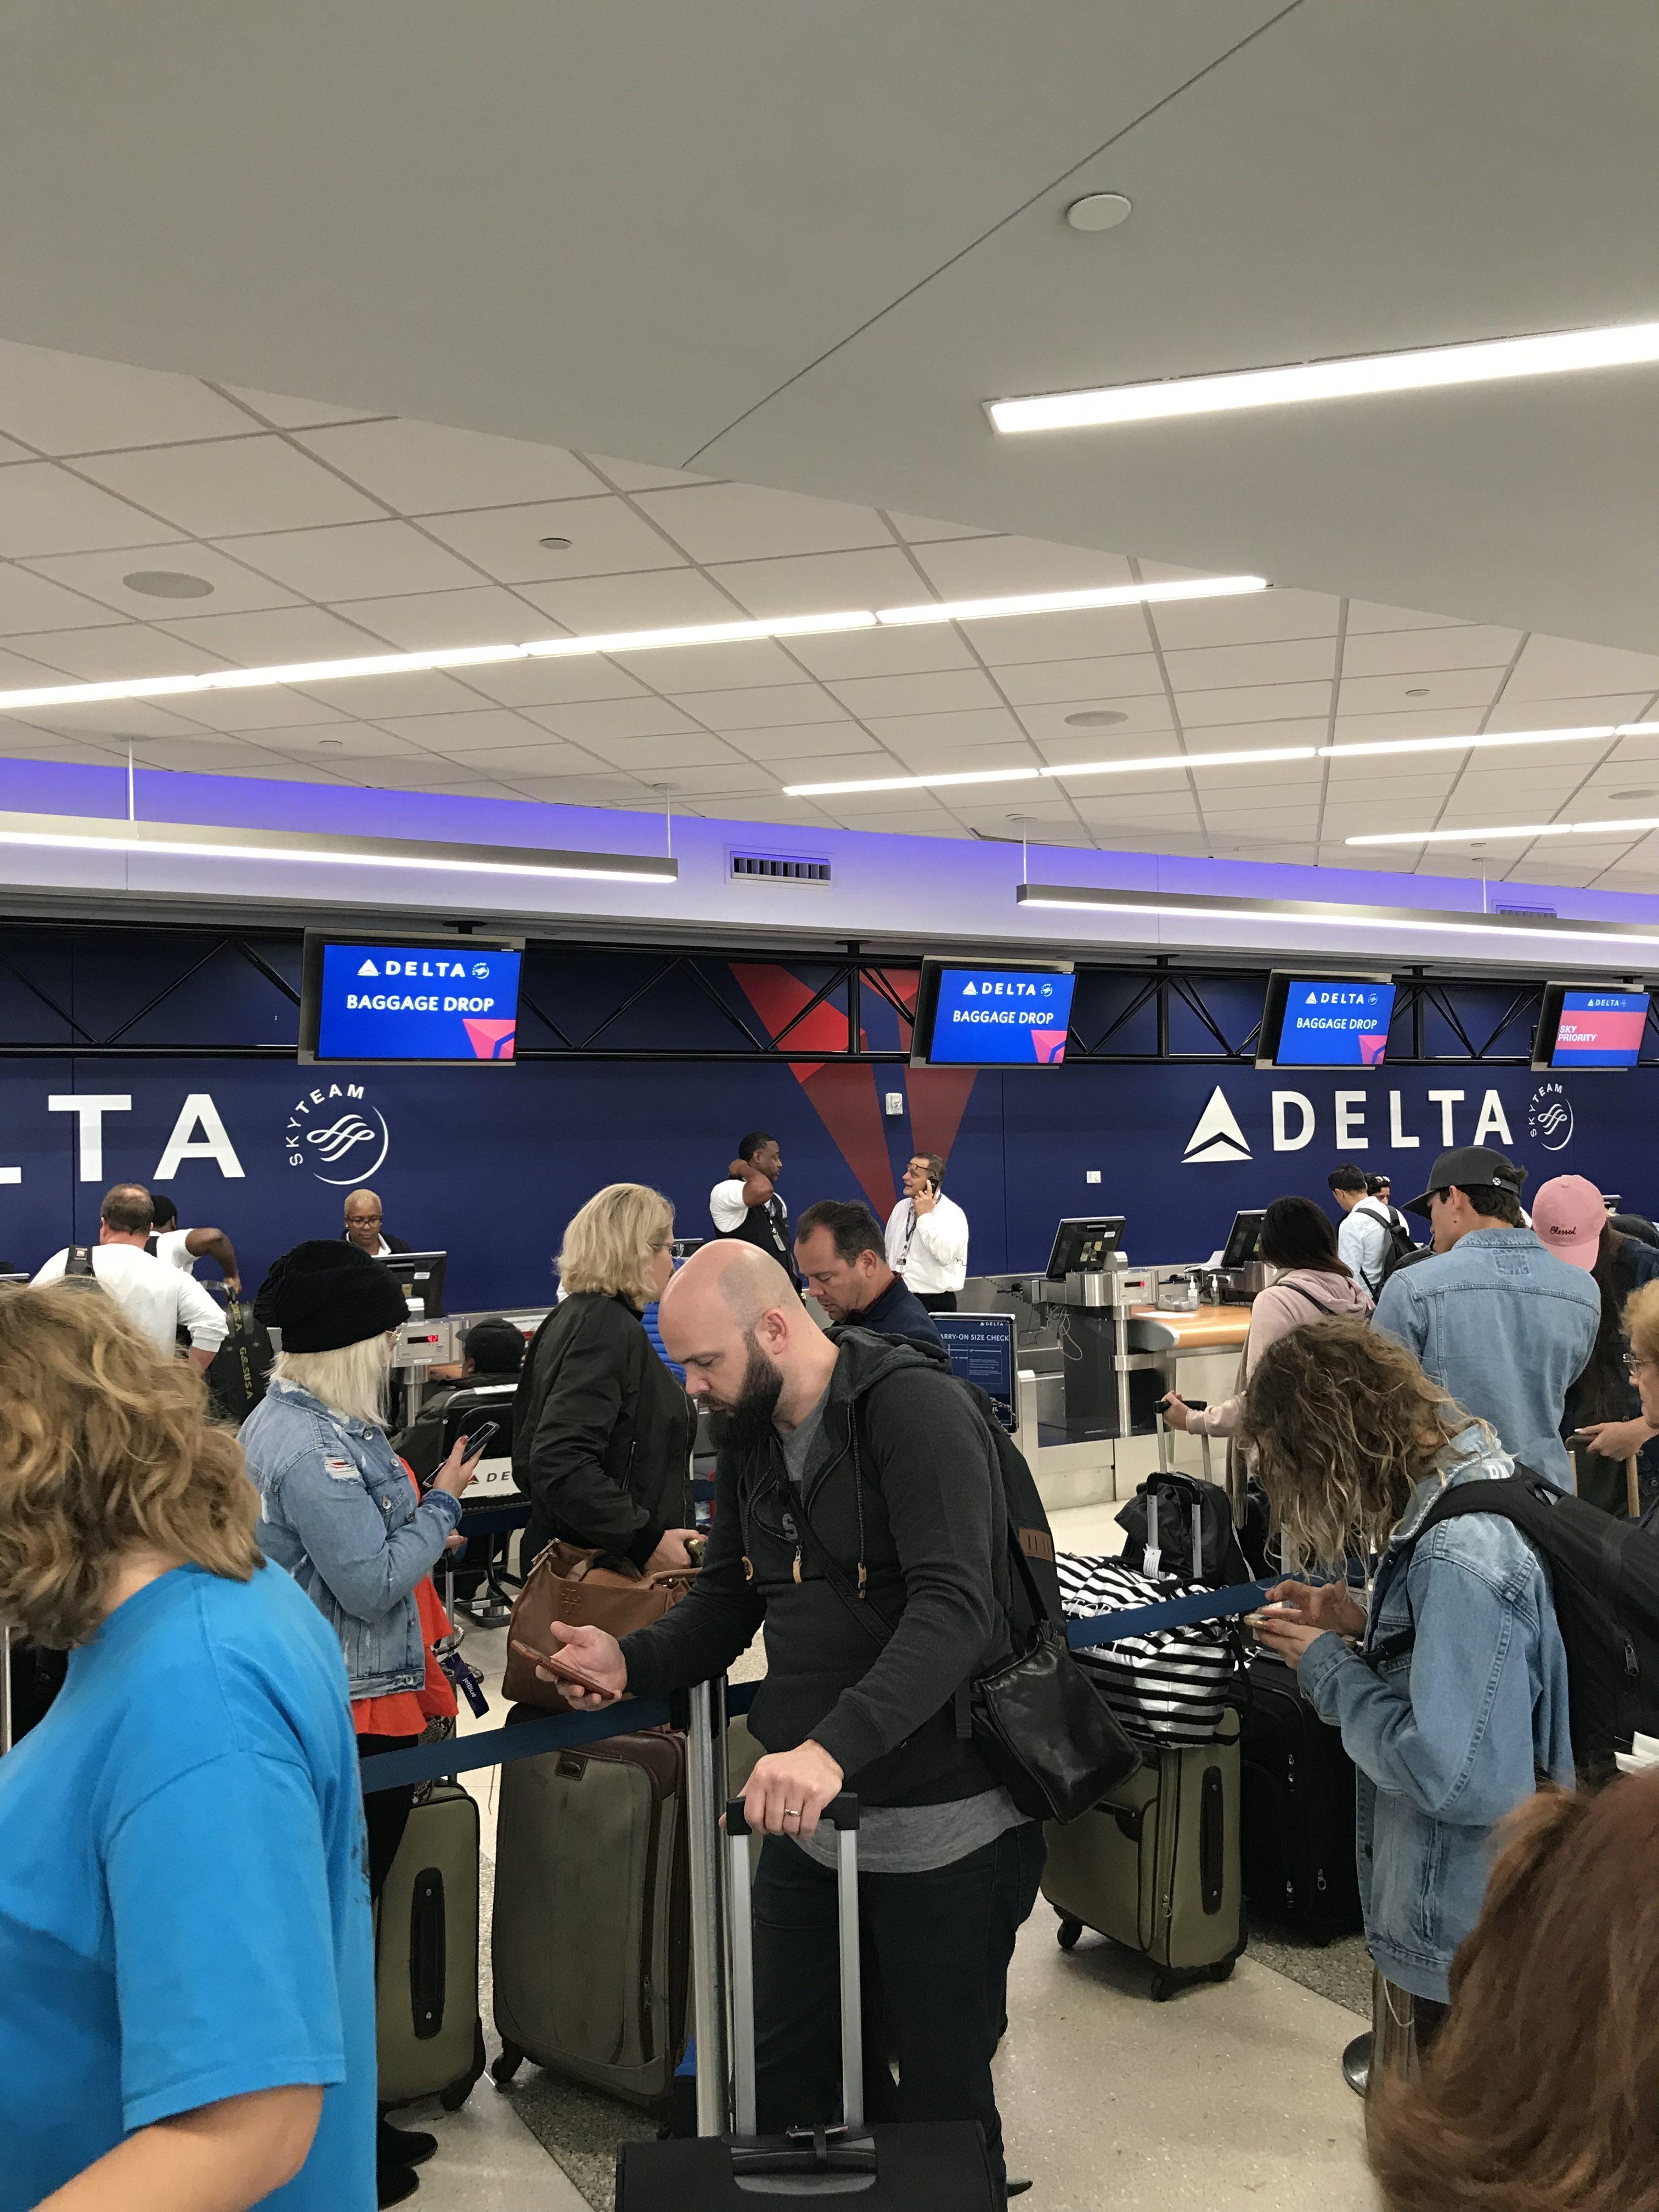 Atlanta Hartsfield Airport Customer Reviews Skytrax